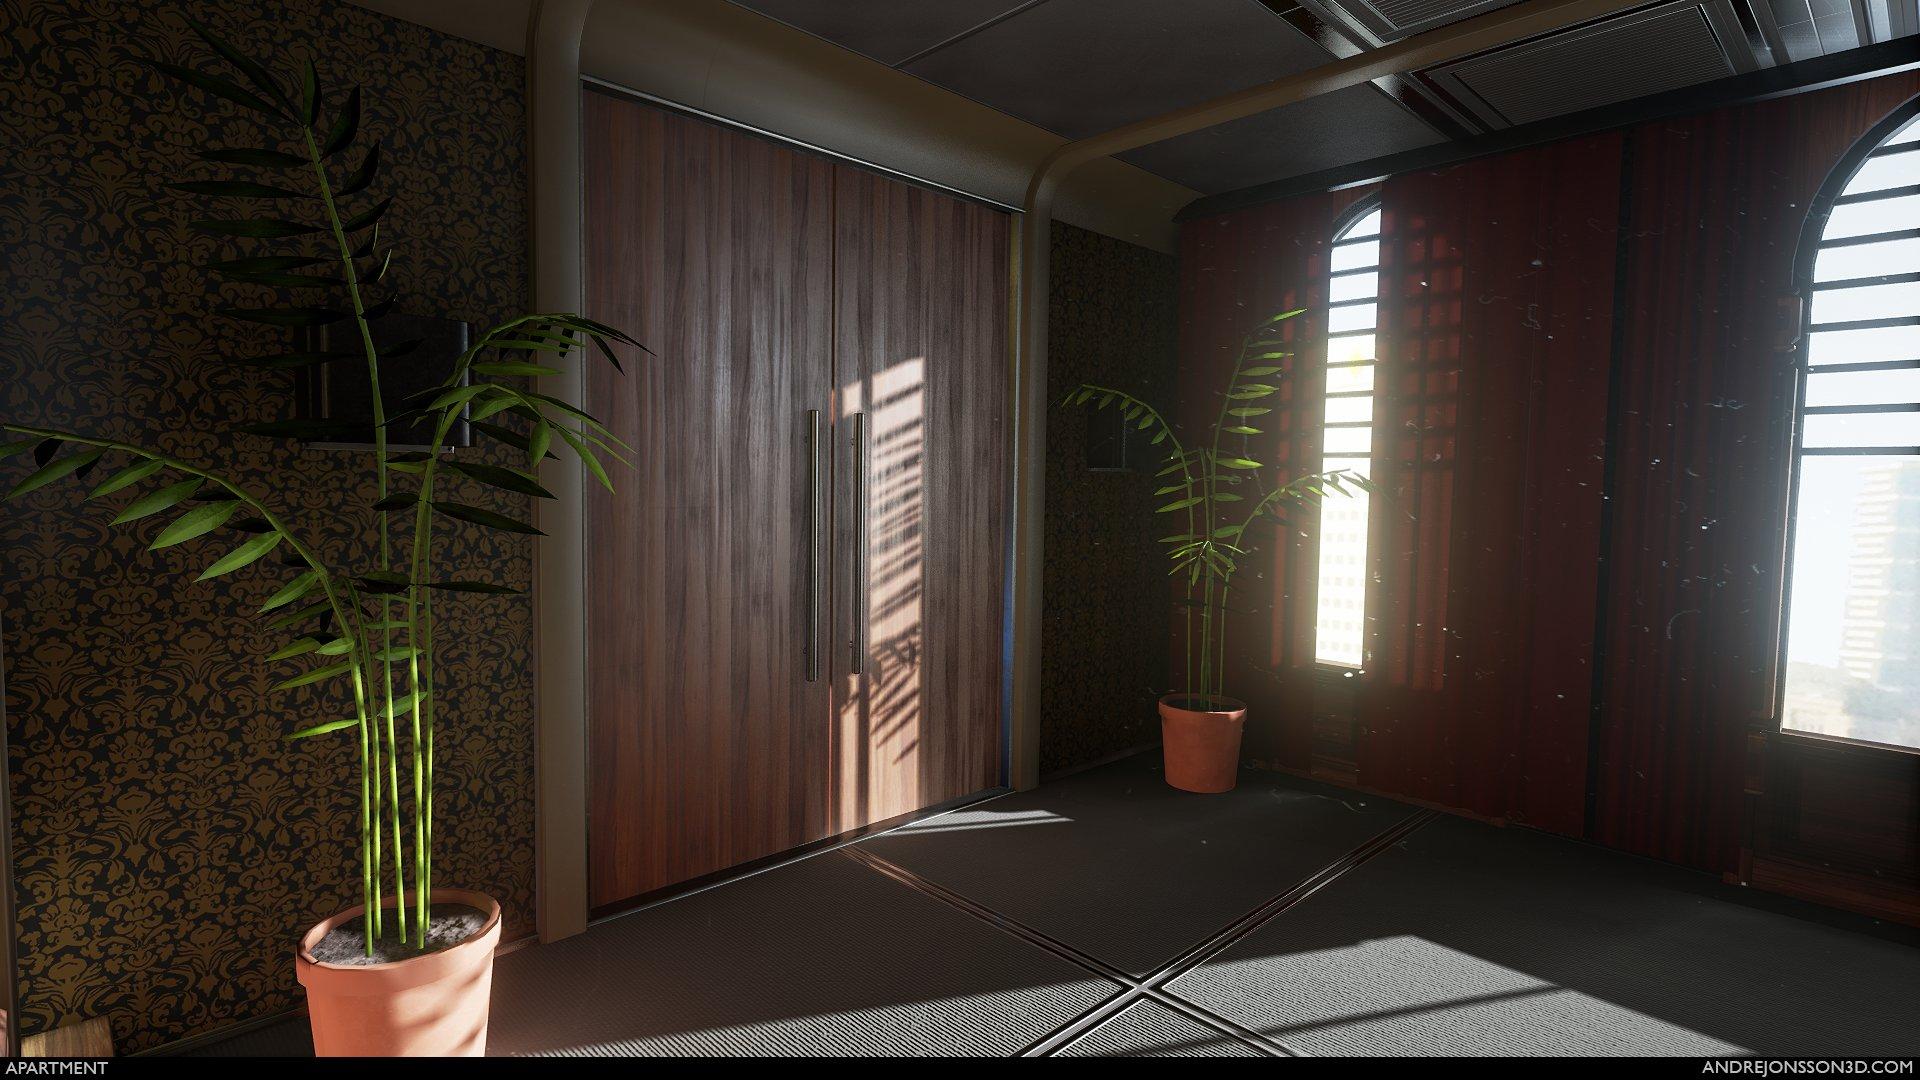 Andre jonsson apartment 03